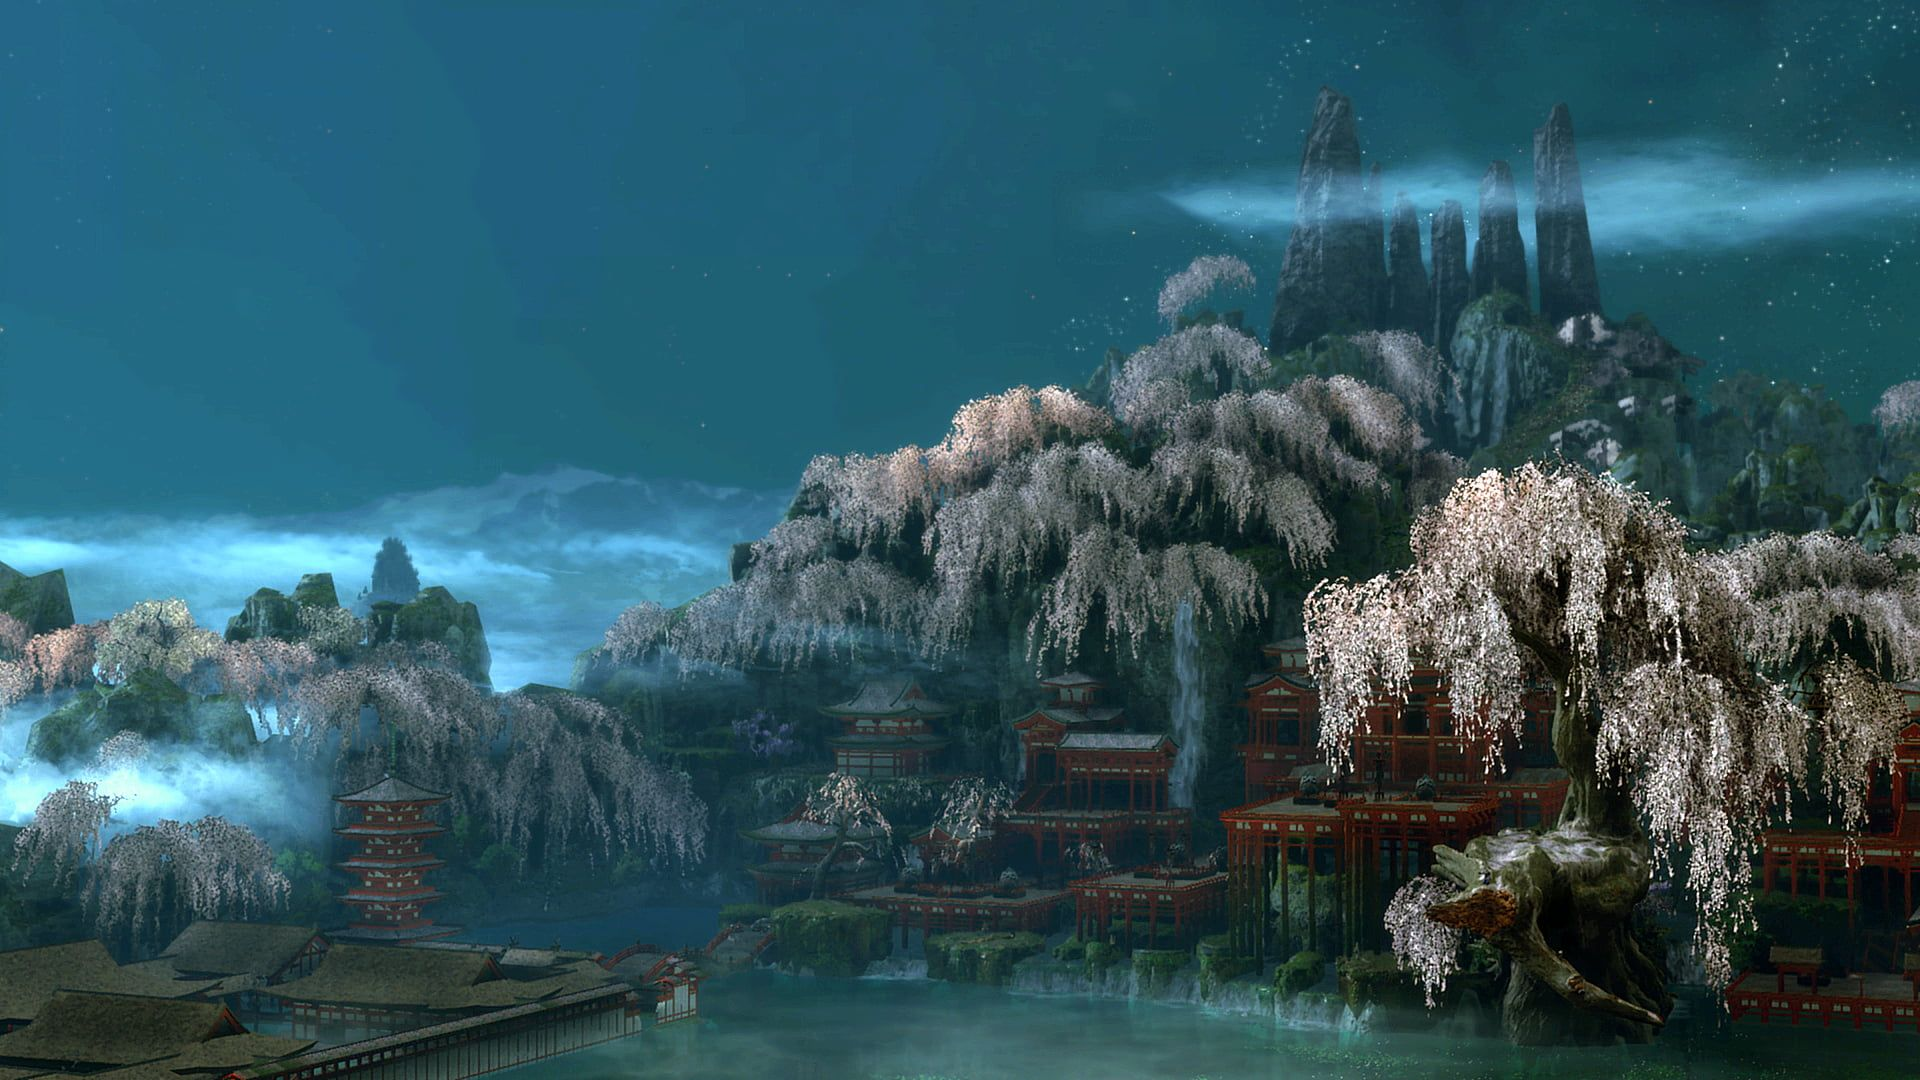 Sekiro Shadows Die Twice Screen Shot Video Game Art Cherry Blossom Pagoda Japan Water Mountains Night Sky Landscape Video Game Art Game Art Hd Wallpaper